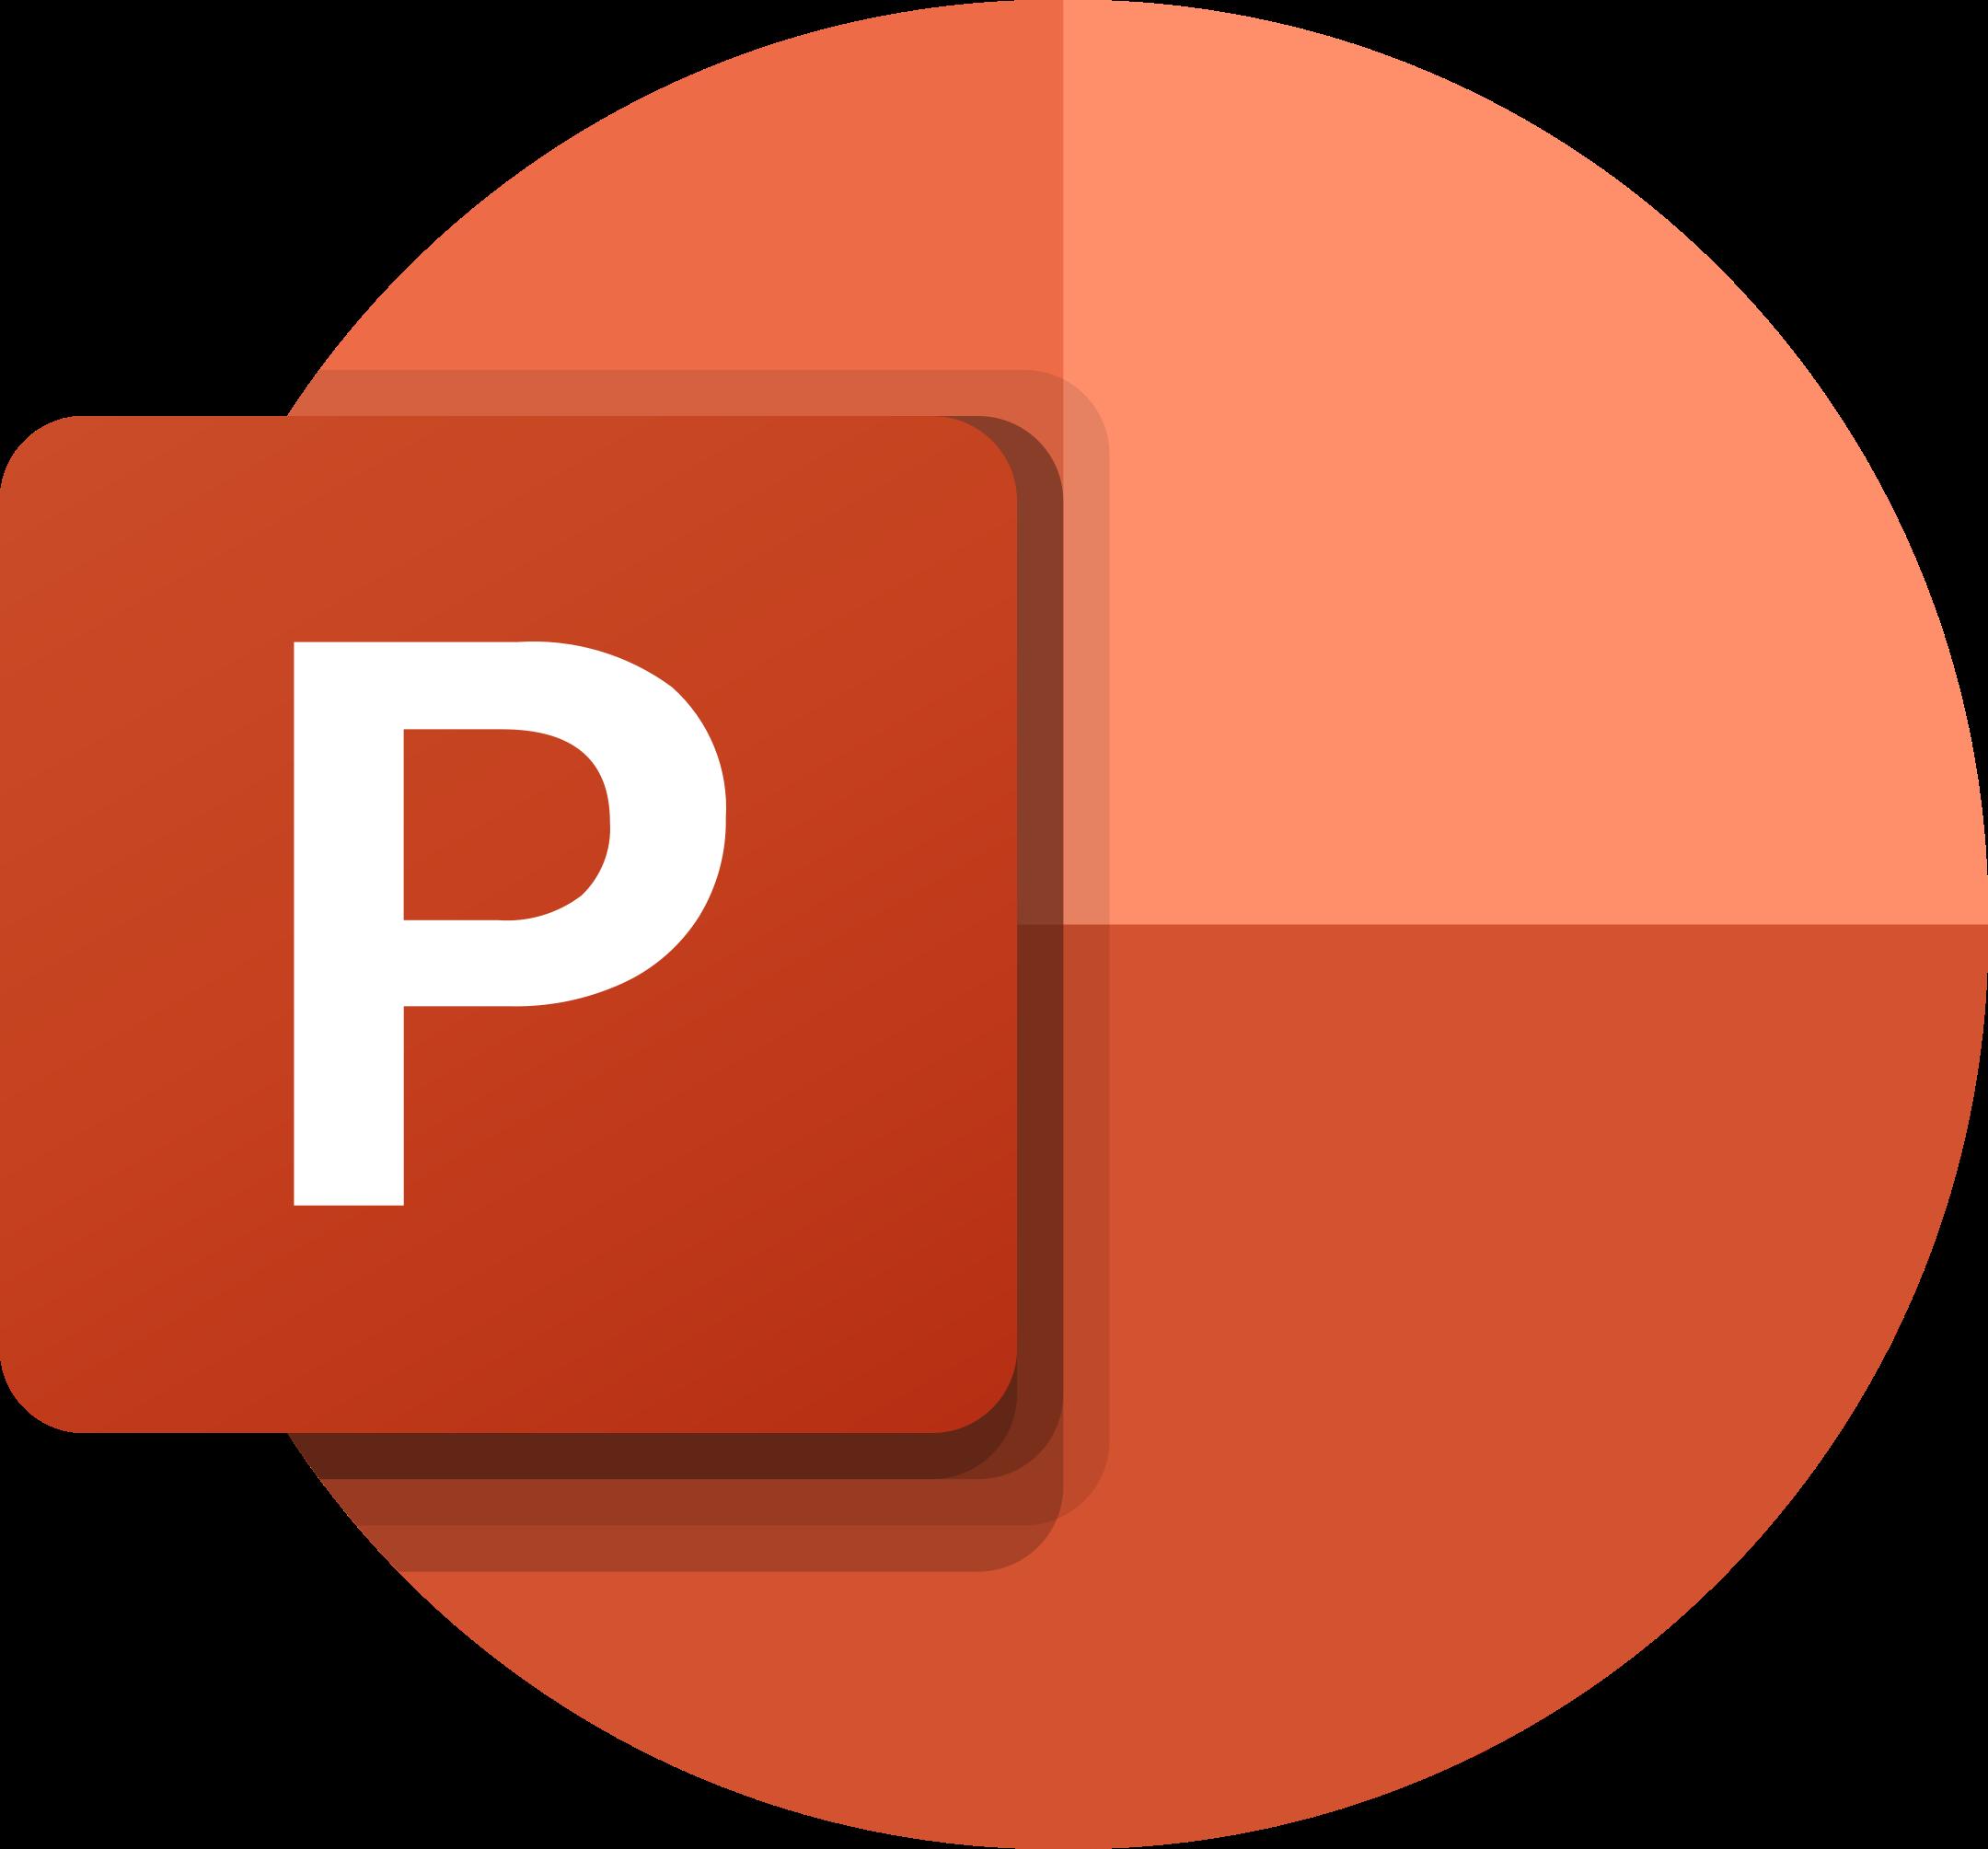 microsoft powerpoint logo 1 - Microsoft PowerPoint Logo